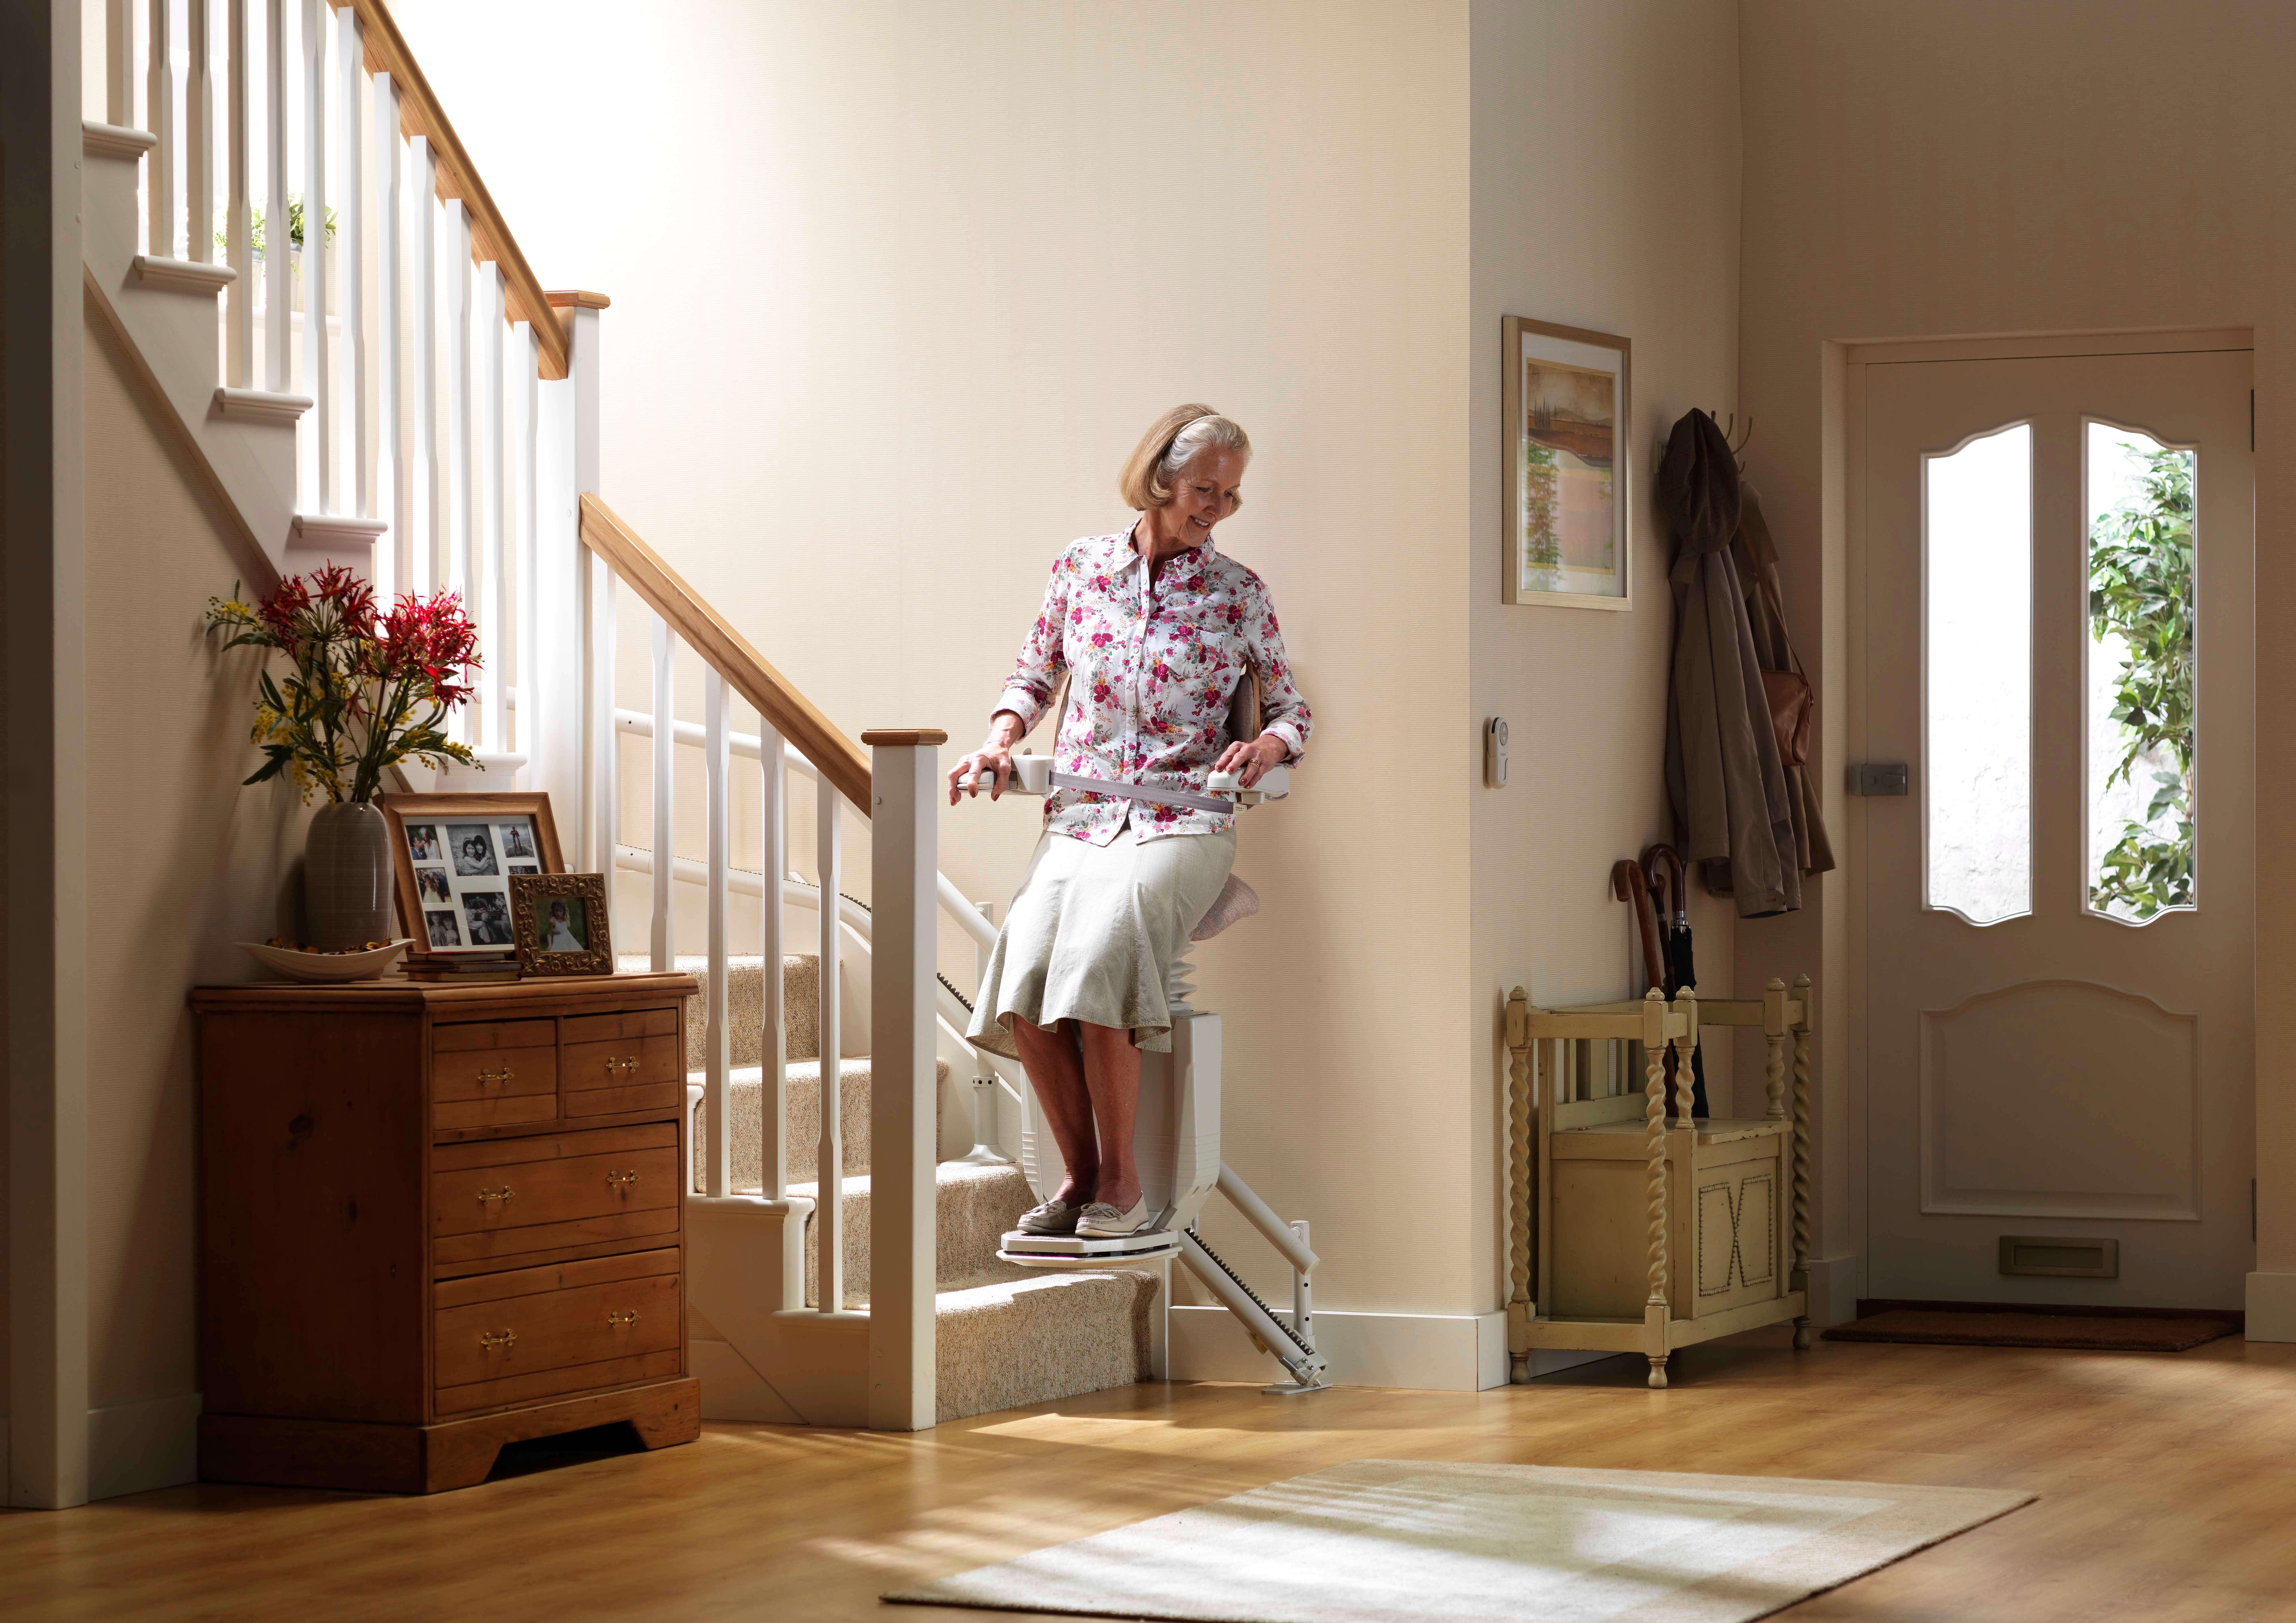 monte escalier 63. Black Bedroom Furniture Sets. Home Design Ideas